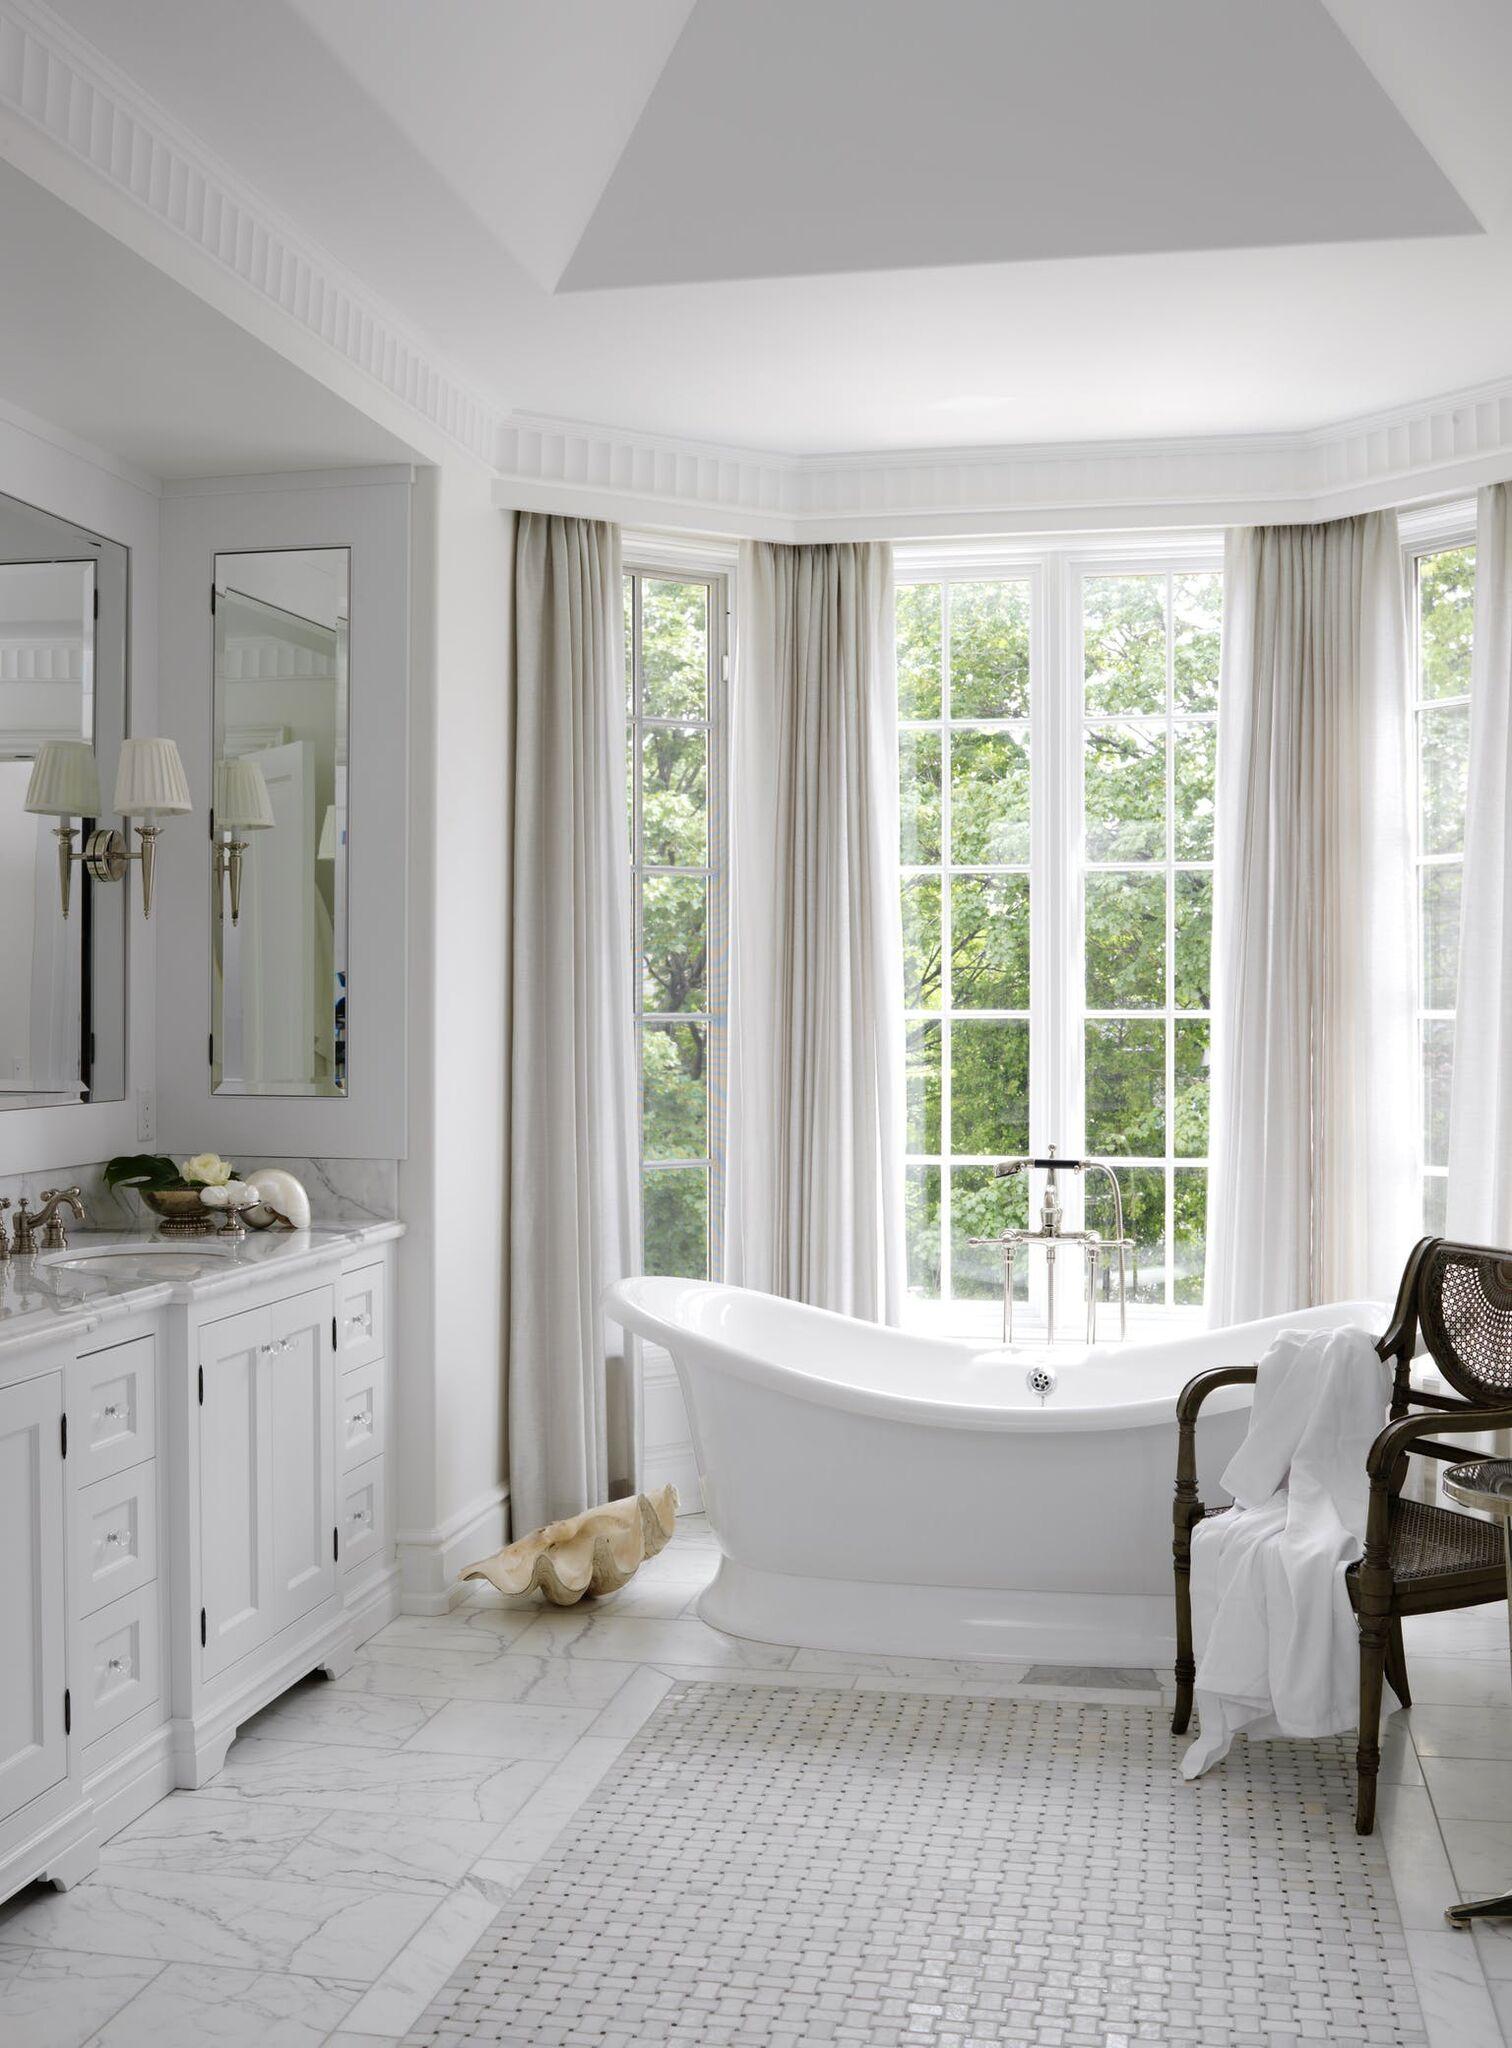 JDD_best luxury bathrooms_Design_www.douglasdesignstudio.com_on the blog of interior designer Jana Donohoe Designs of Fayetteville, North Carolina .jpeg